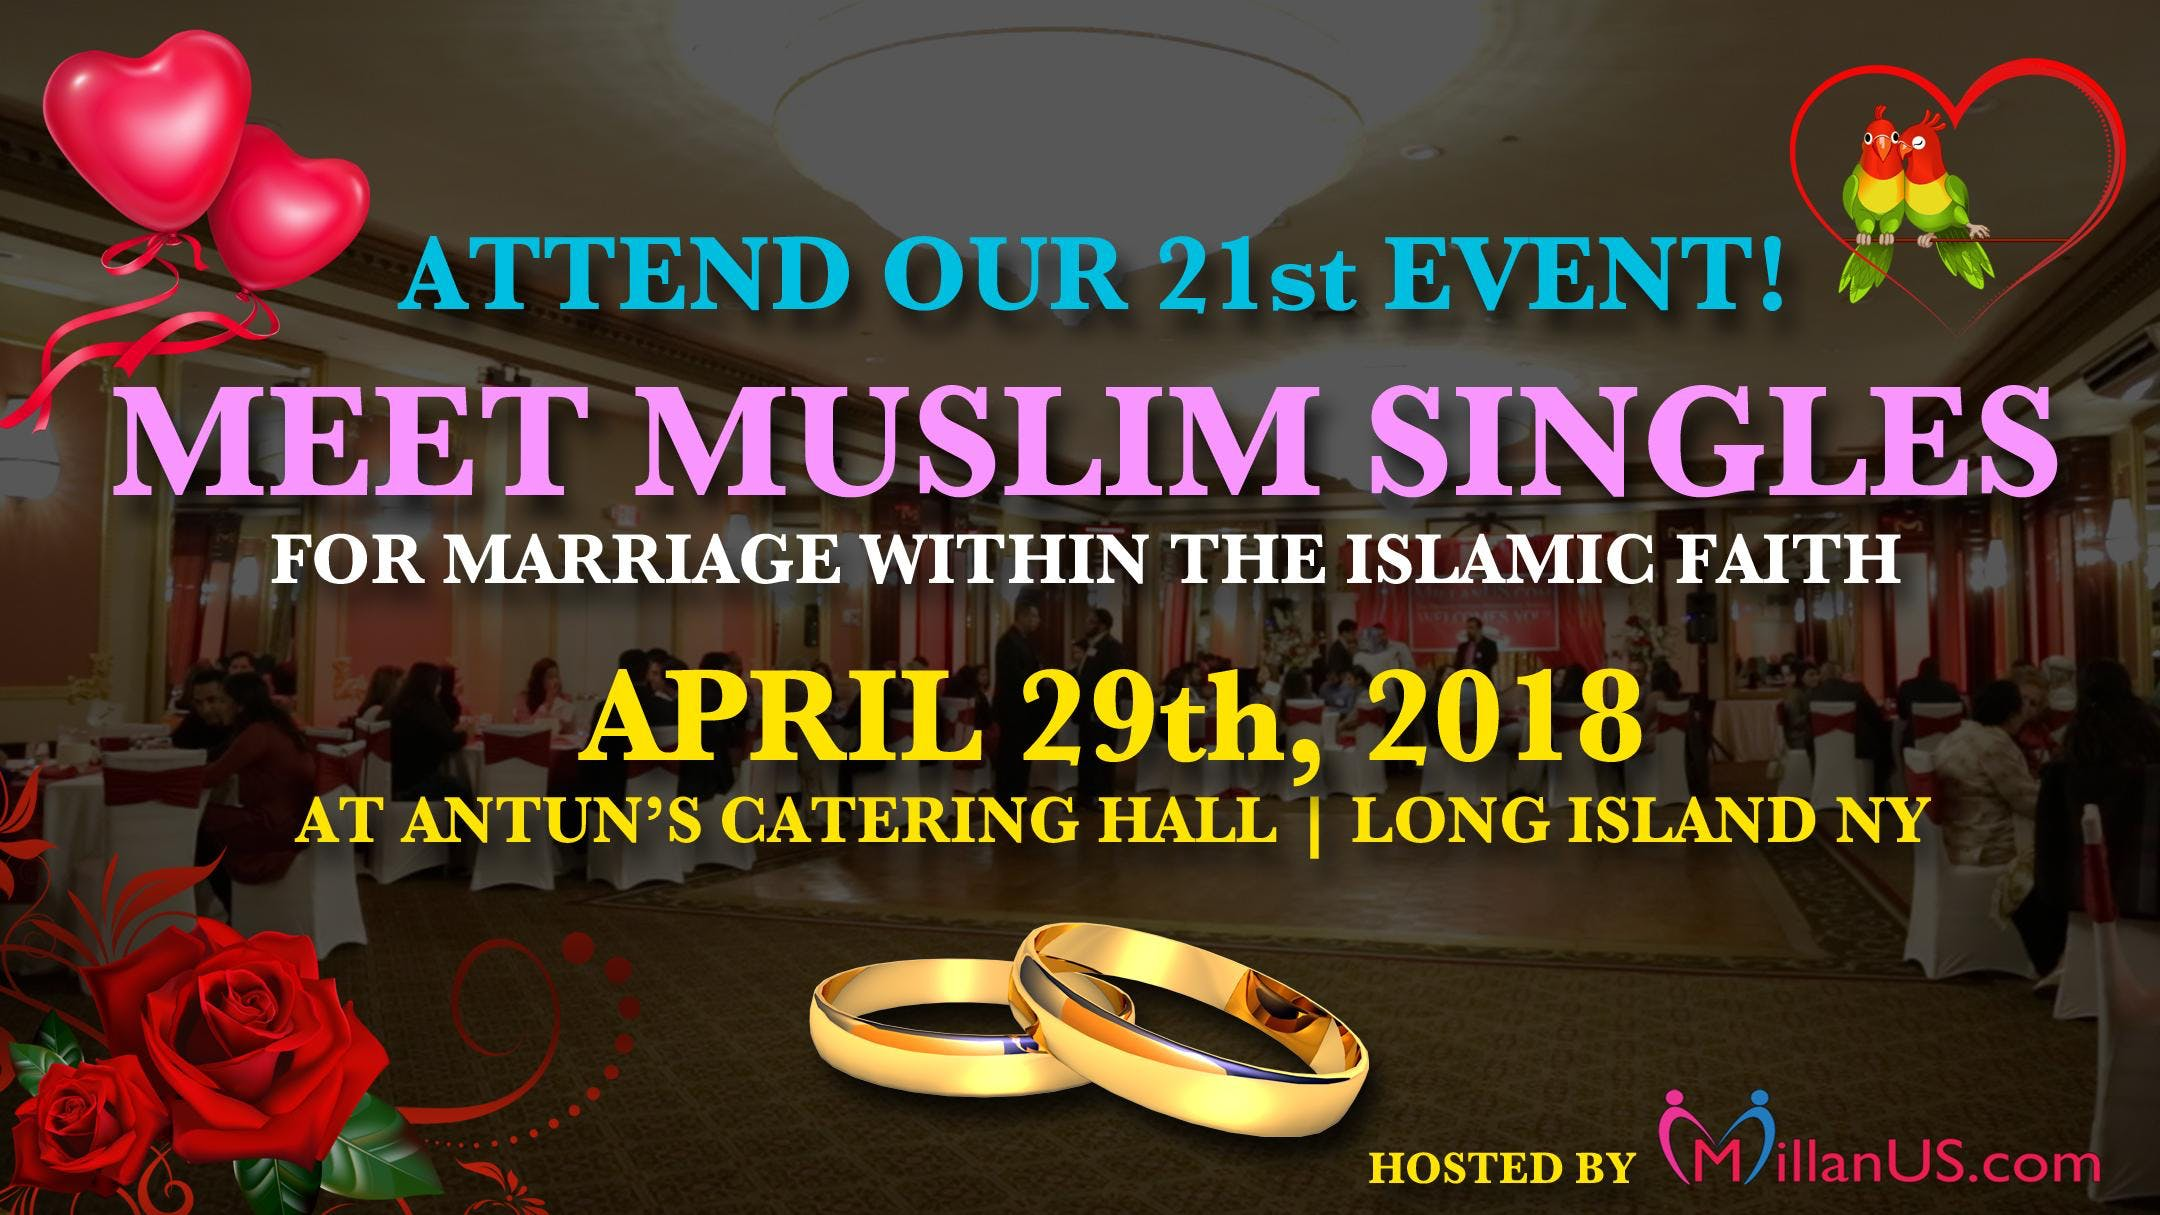 Muslim singles event